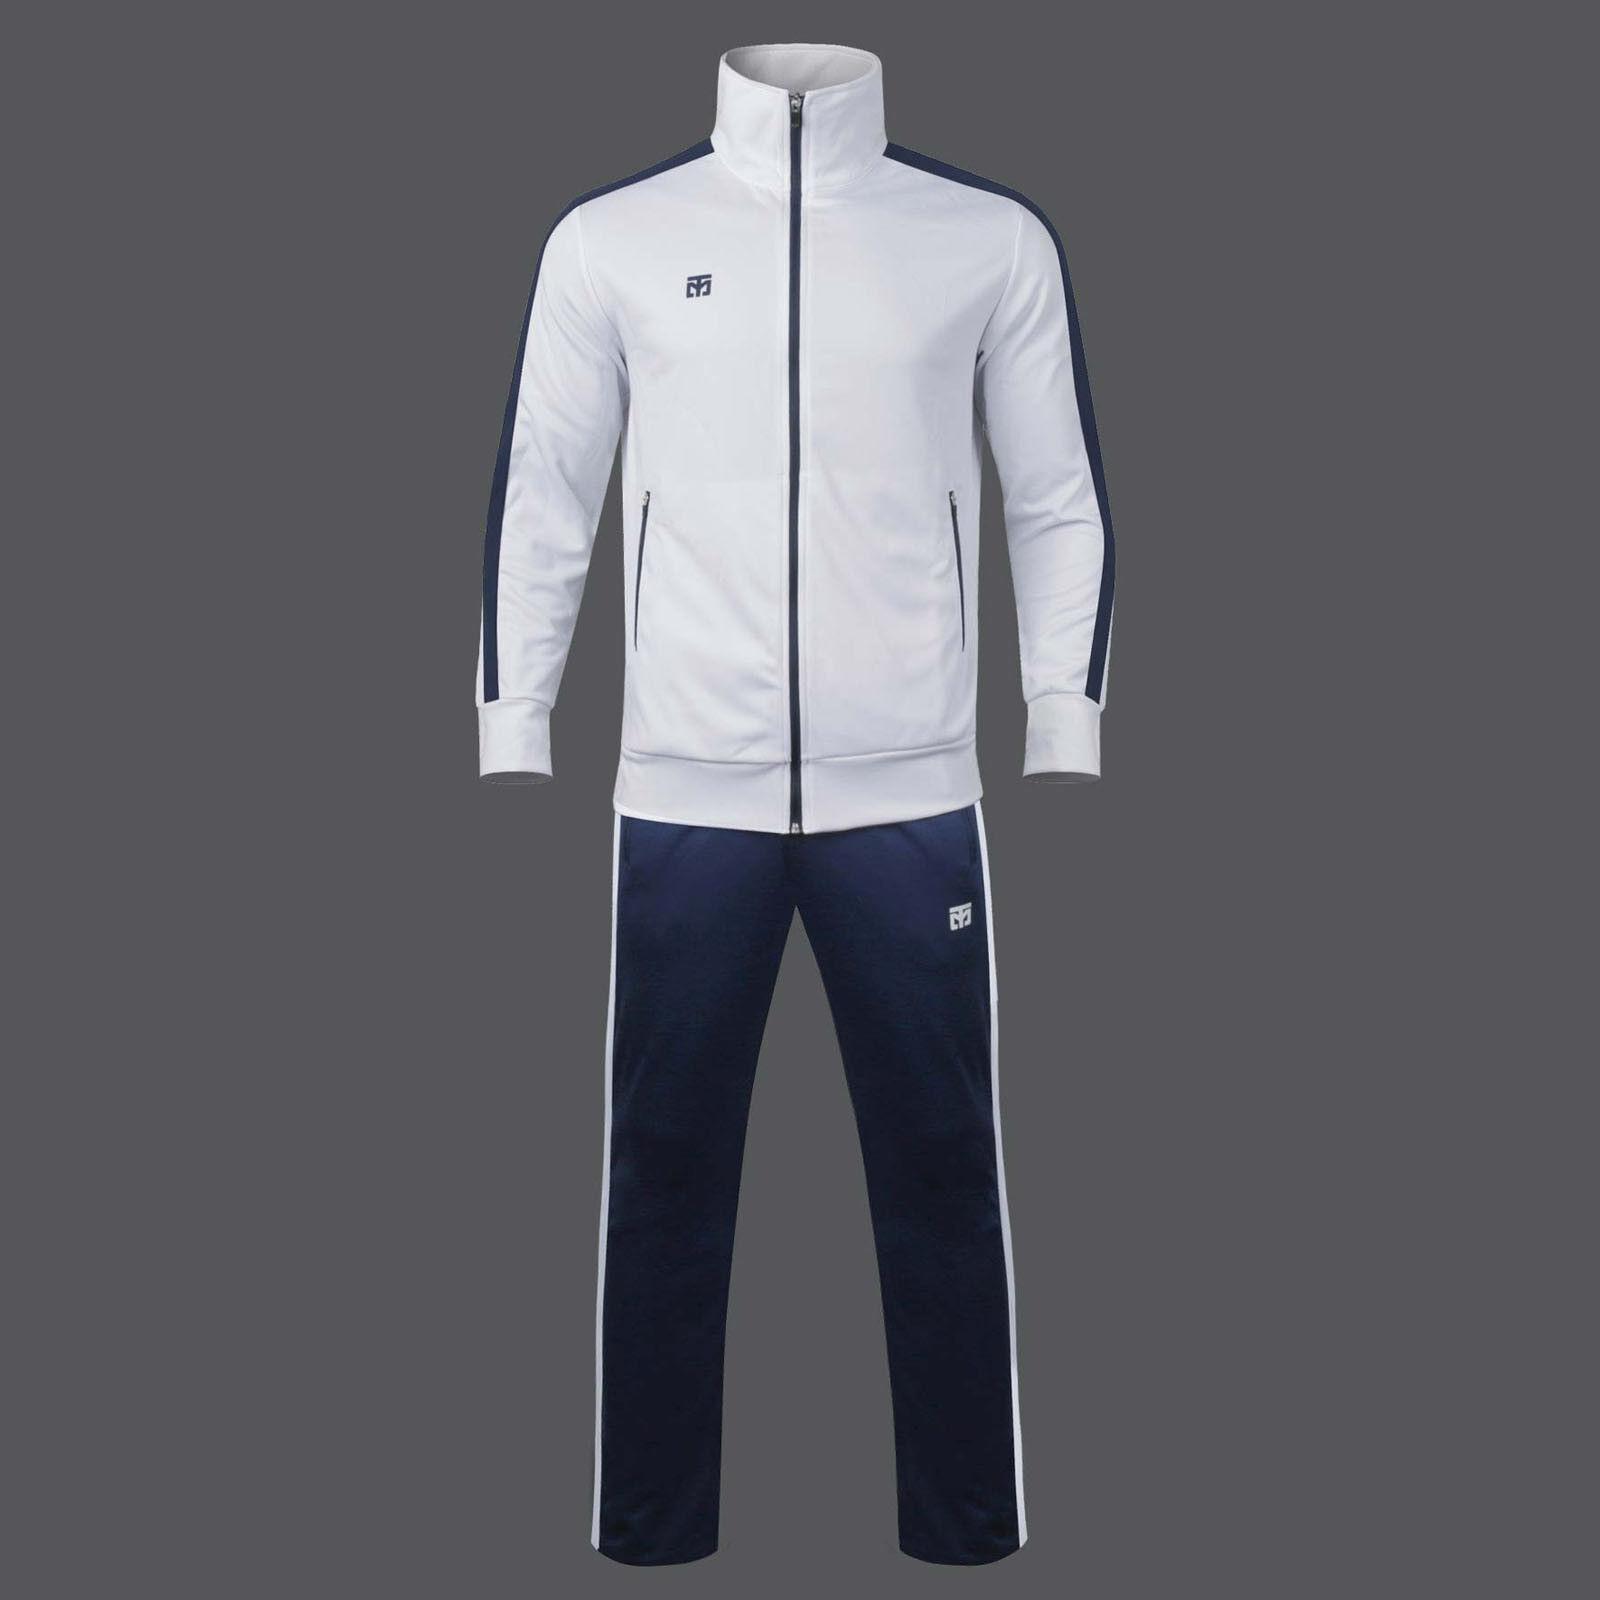 Evan Training Suits Set White Top Navy Pants Slim Fits Mooto Running Taekwondo